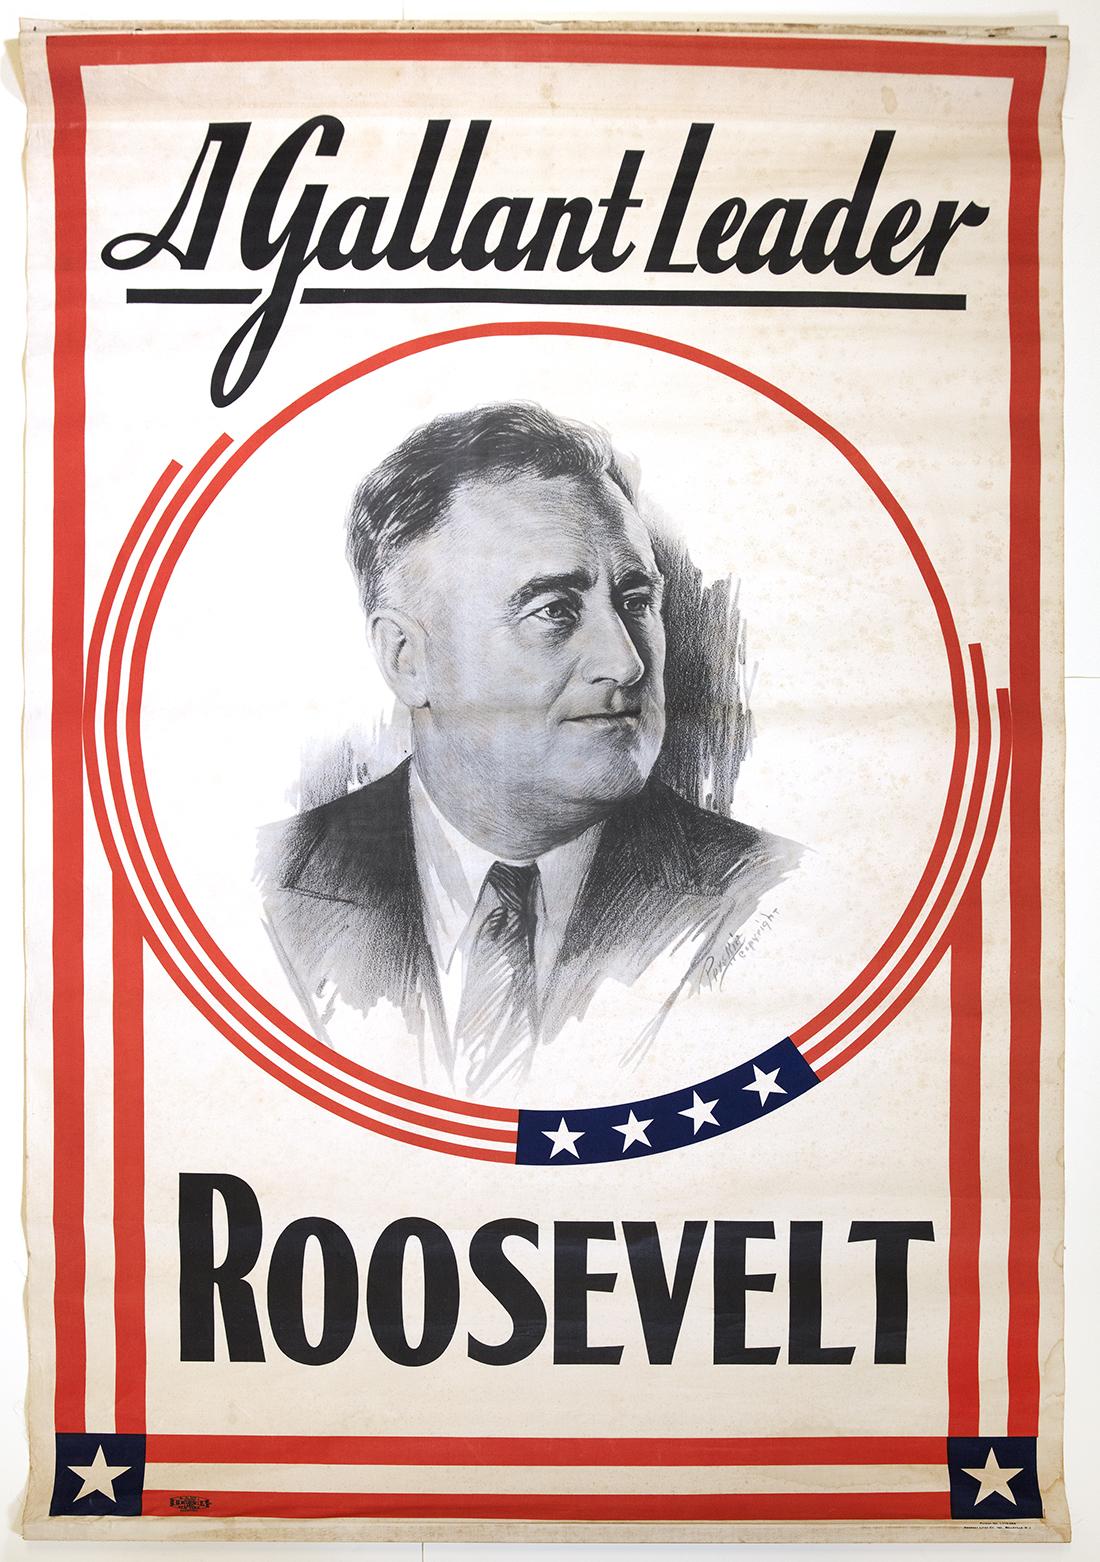 A Gallant Leader. Roosevelt. 1936. (FDRL)